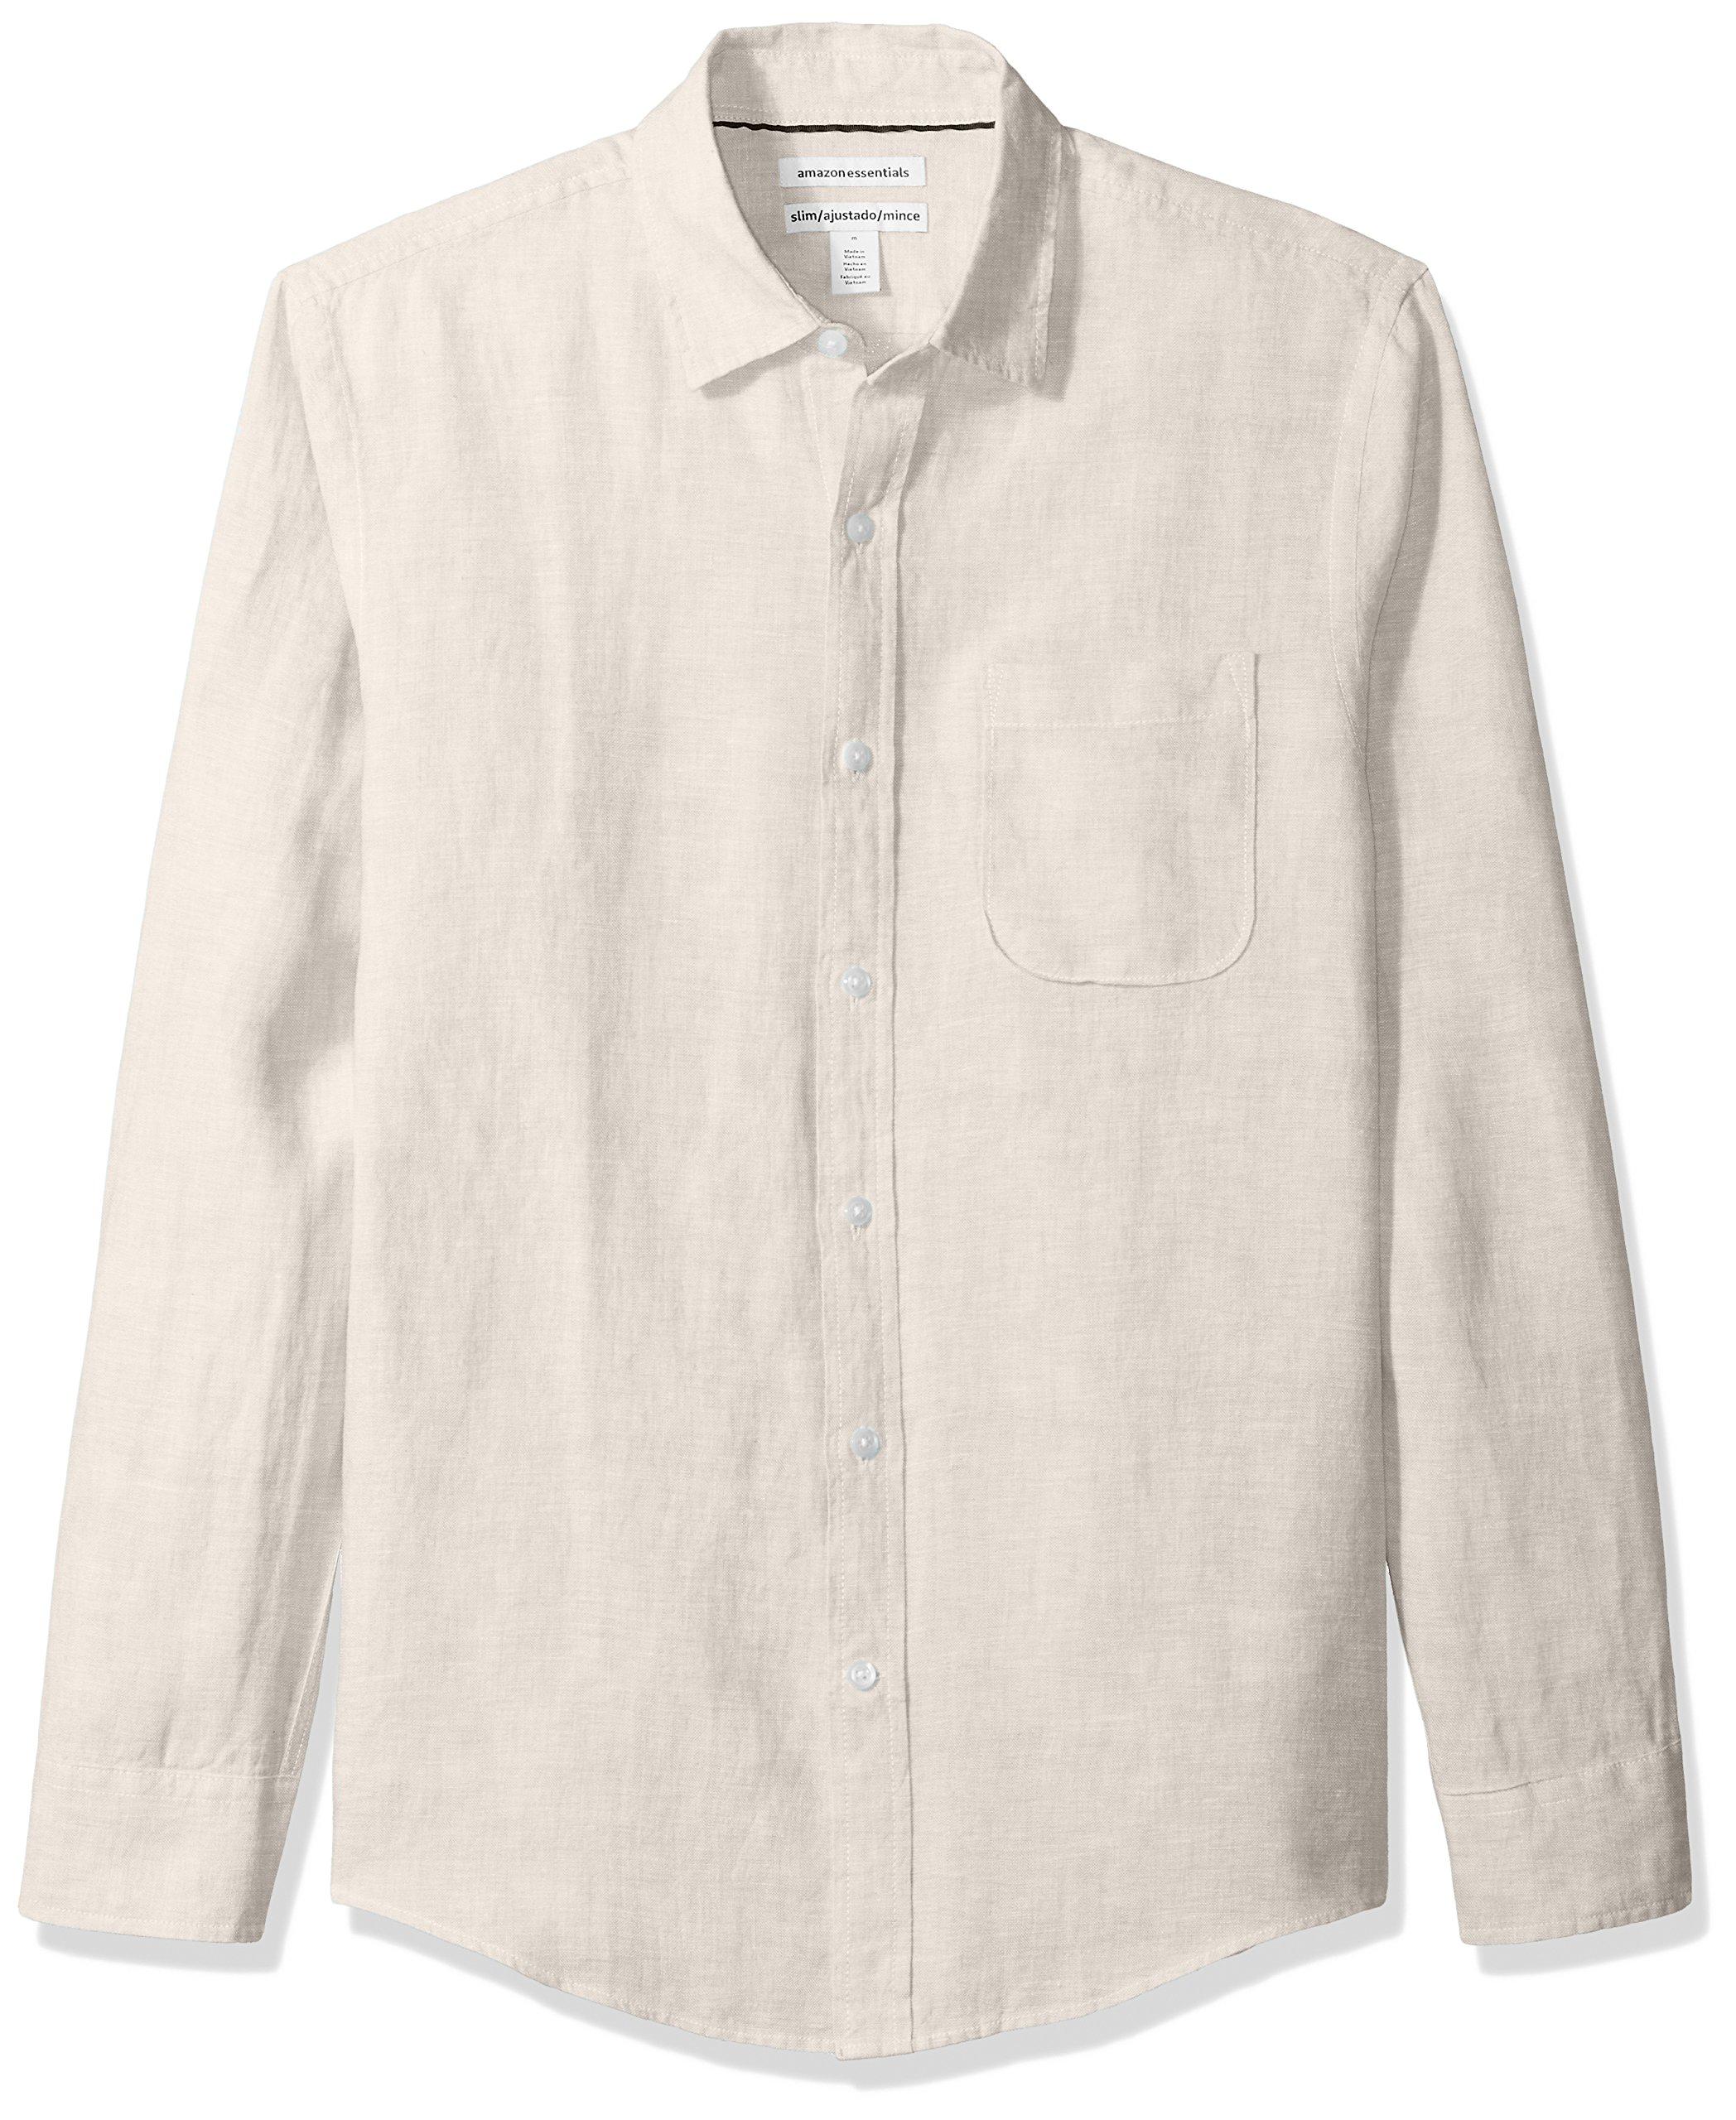 Amazon Essentials Men's Slim-Fit Long-Sleeve Linen Shirt, Natural, X-Large